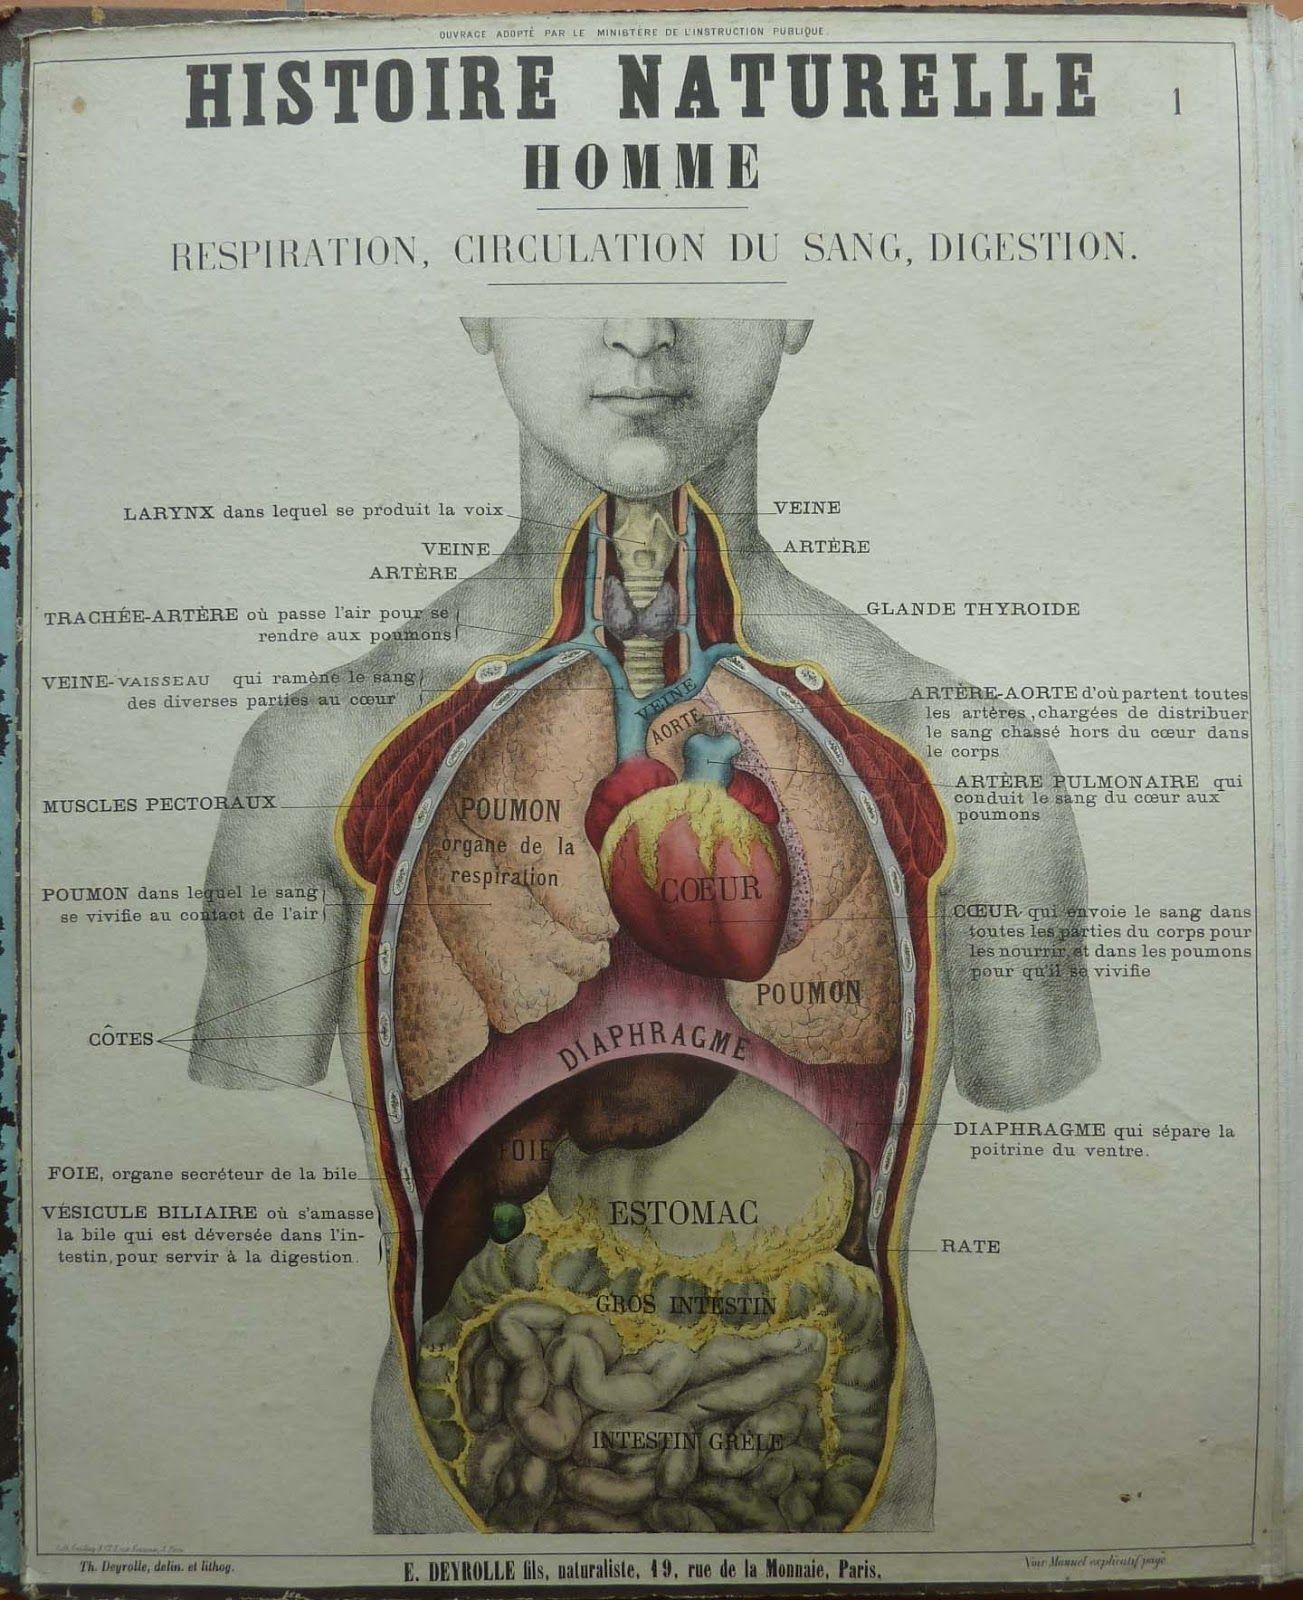 Deyrolle - Histoire Naturelle - Homme - Respiration / Circulation du ...